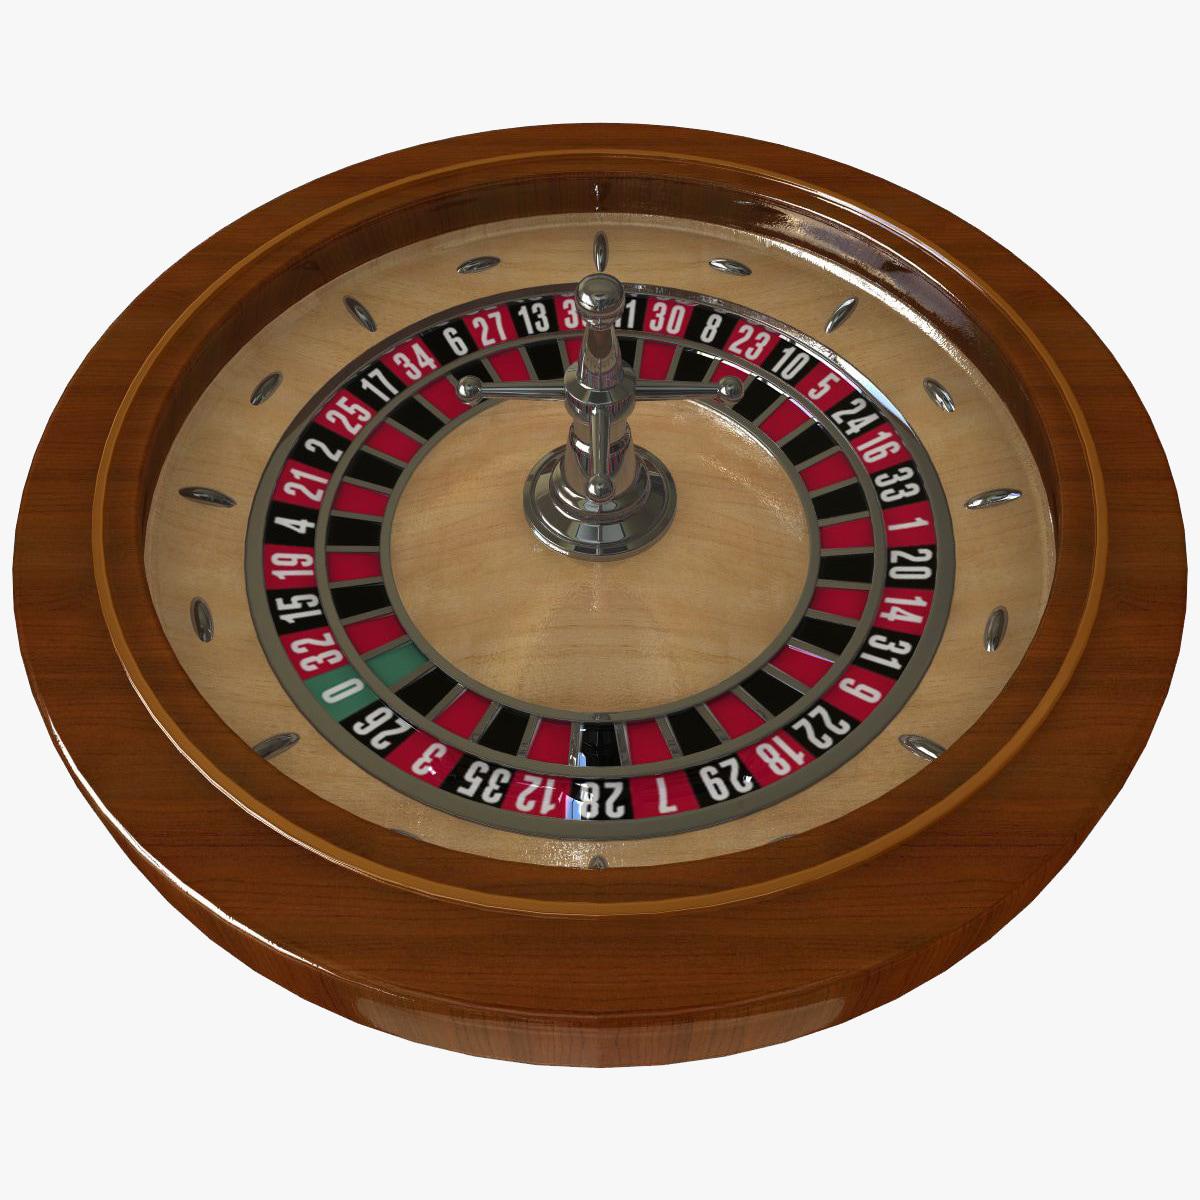 Online Roulette Bet